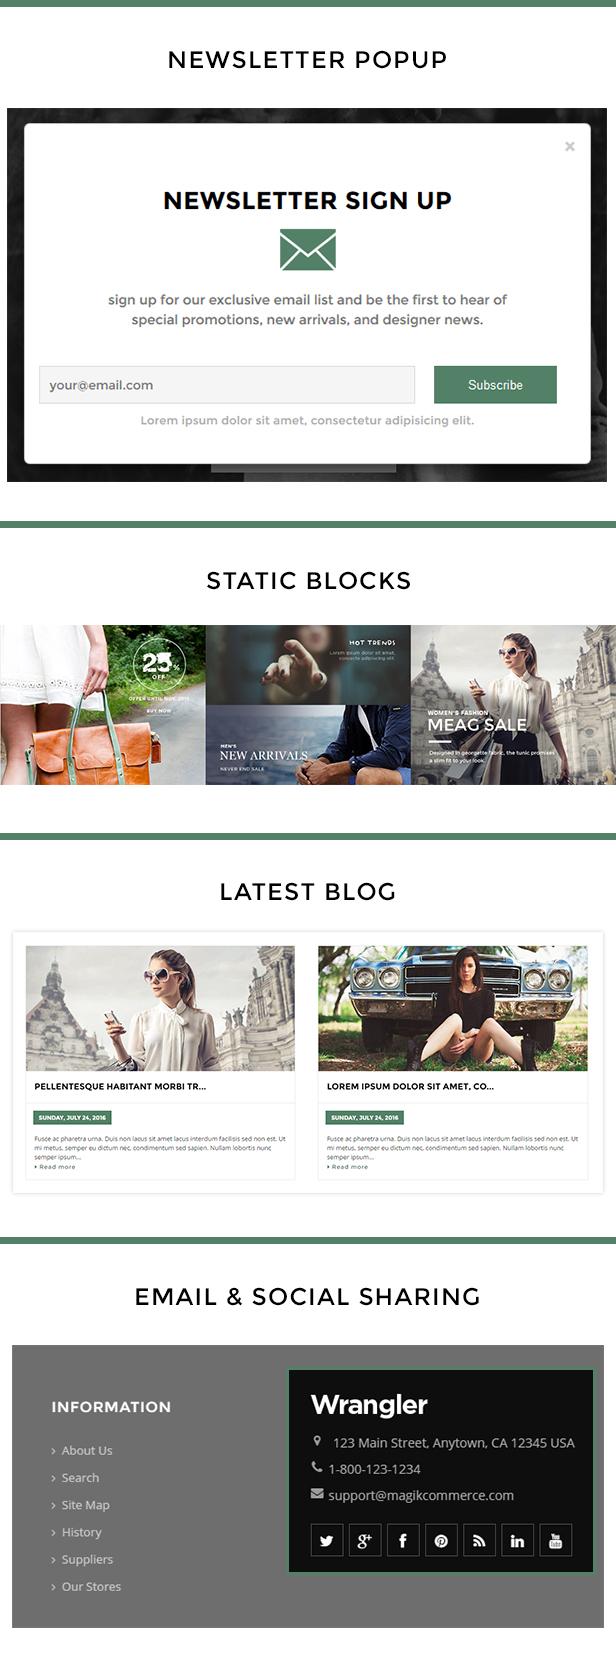 Wrangler Fashion Store Shopify Theme & Template